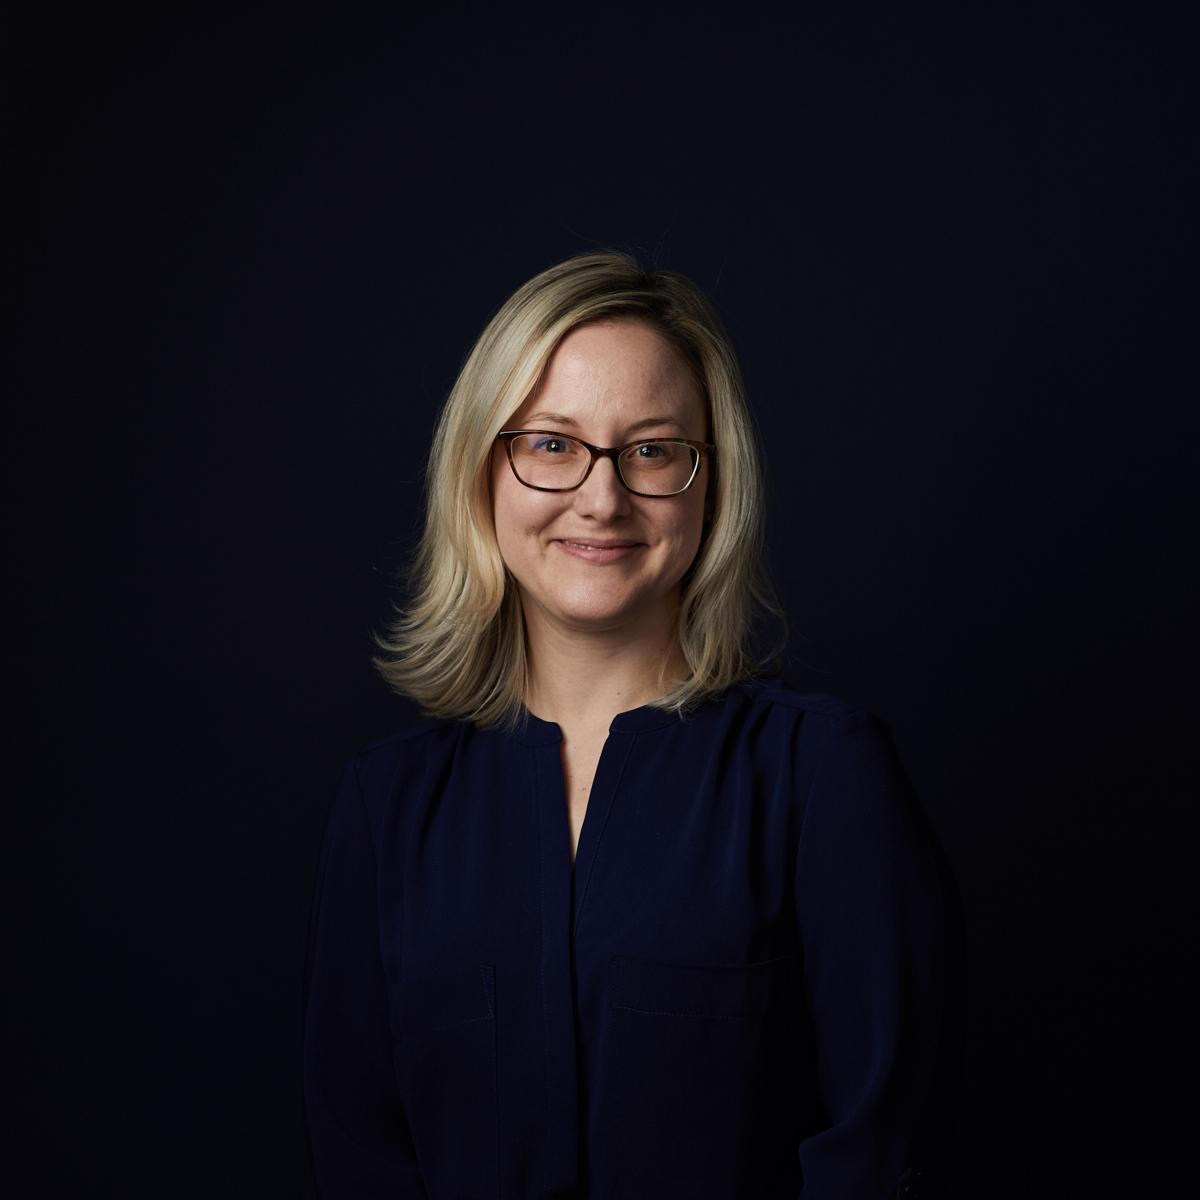 Karine Turcotte, BBA, D.Fisc, CFA